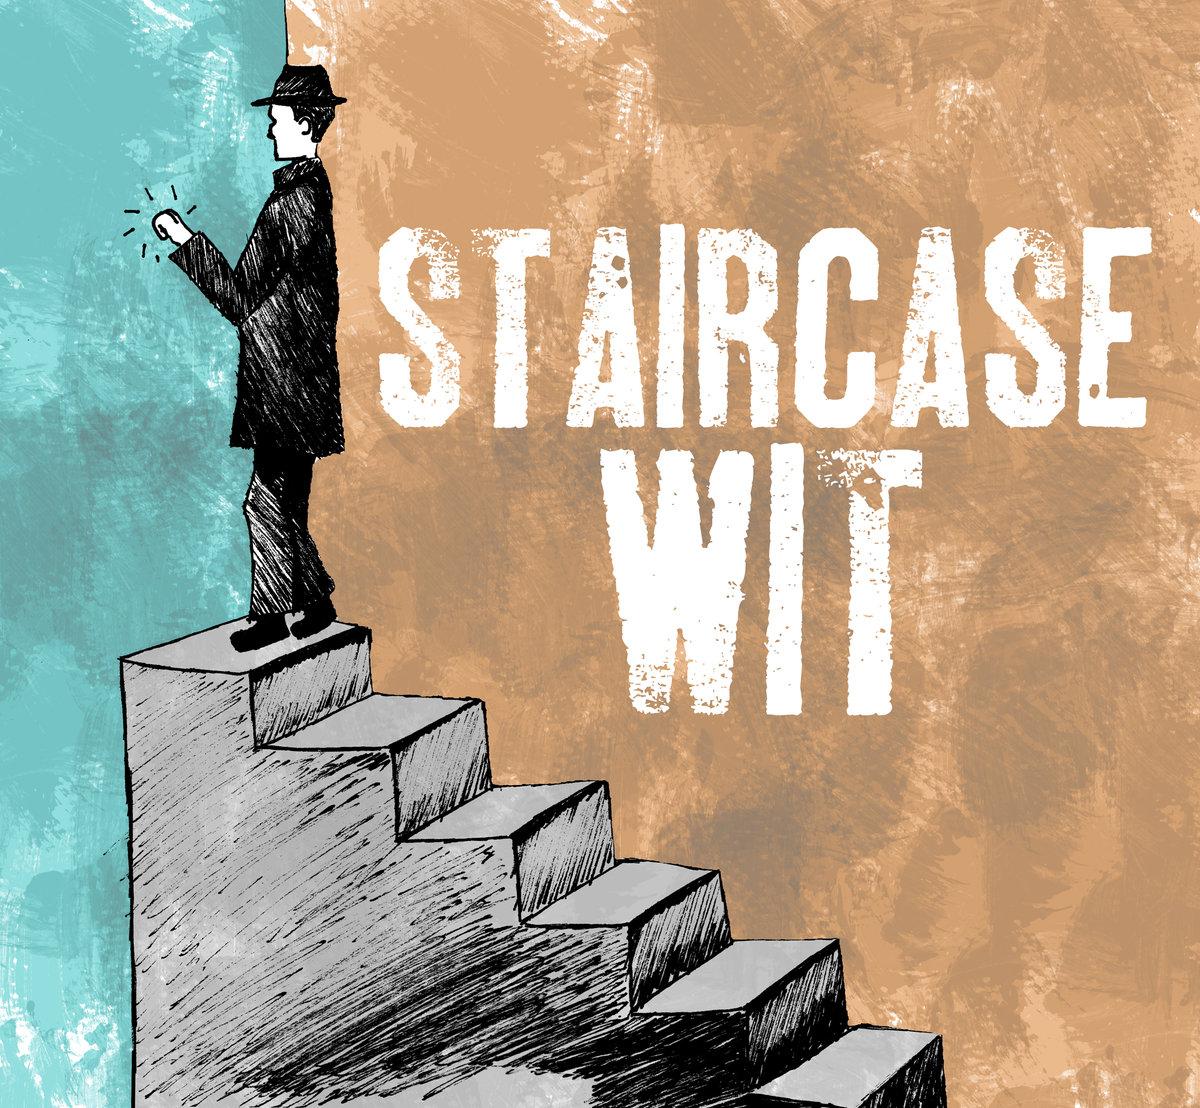 Best Case Scenario - Staircase Wit